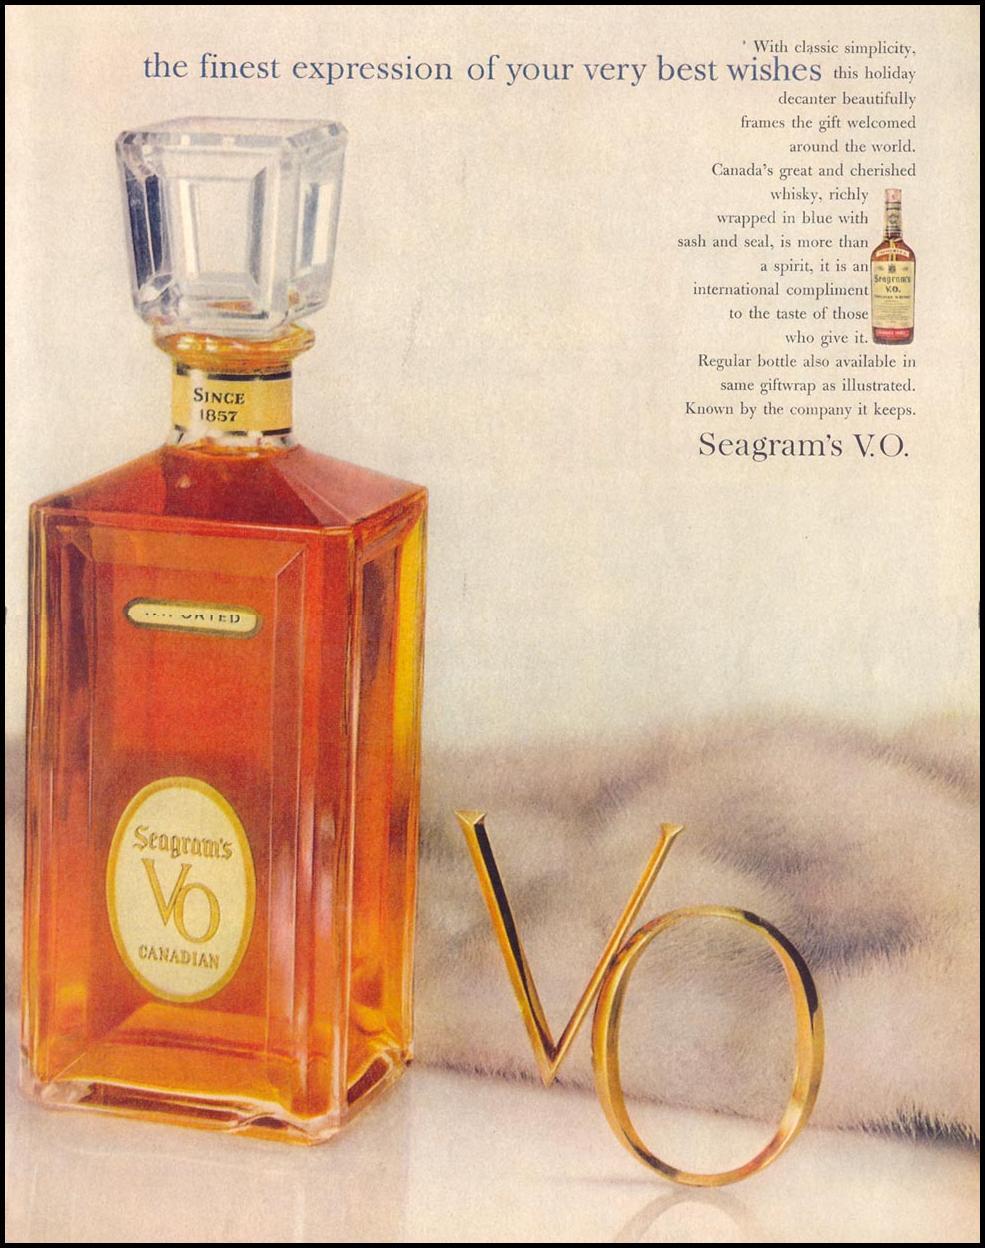 SEAGRAM'S V. O. CANADIAN WHISKY LIFE 12/14/1959 p. 47